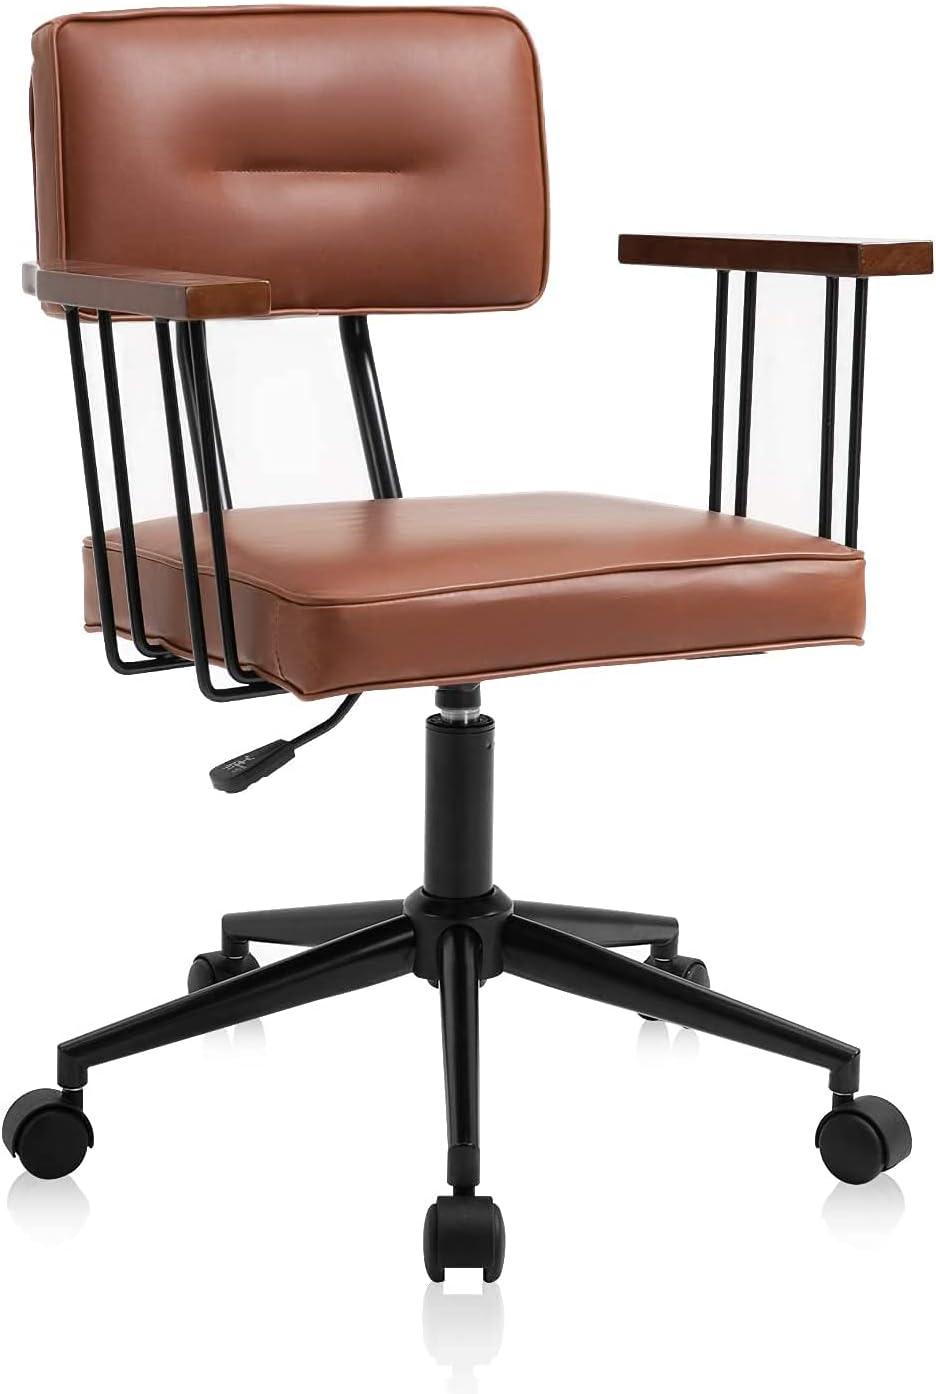 YAMASORO Bürostuhl Ergonomisch Retro Schreibtischstuhl Massivholz Armlehne Bürostuhl Leder Braun Höhenverstellbar Drehstuhl Mit Rollen Rückenlehne…